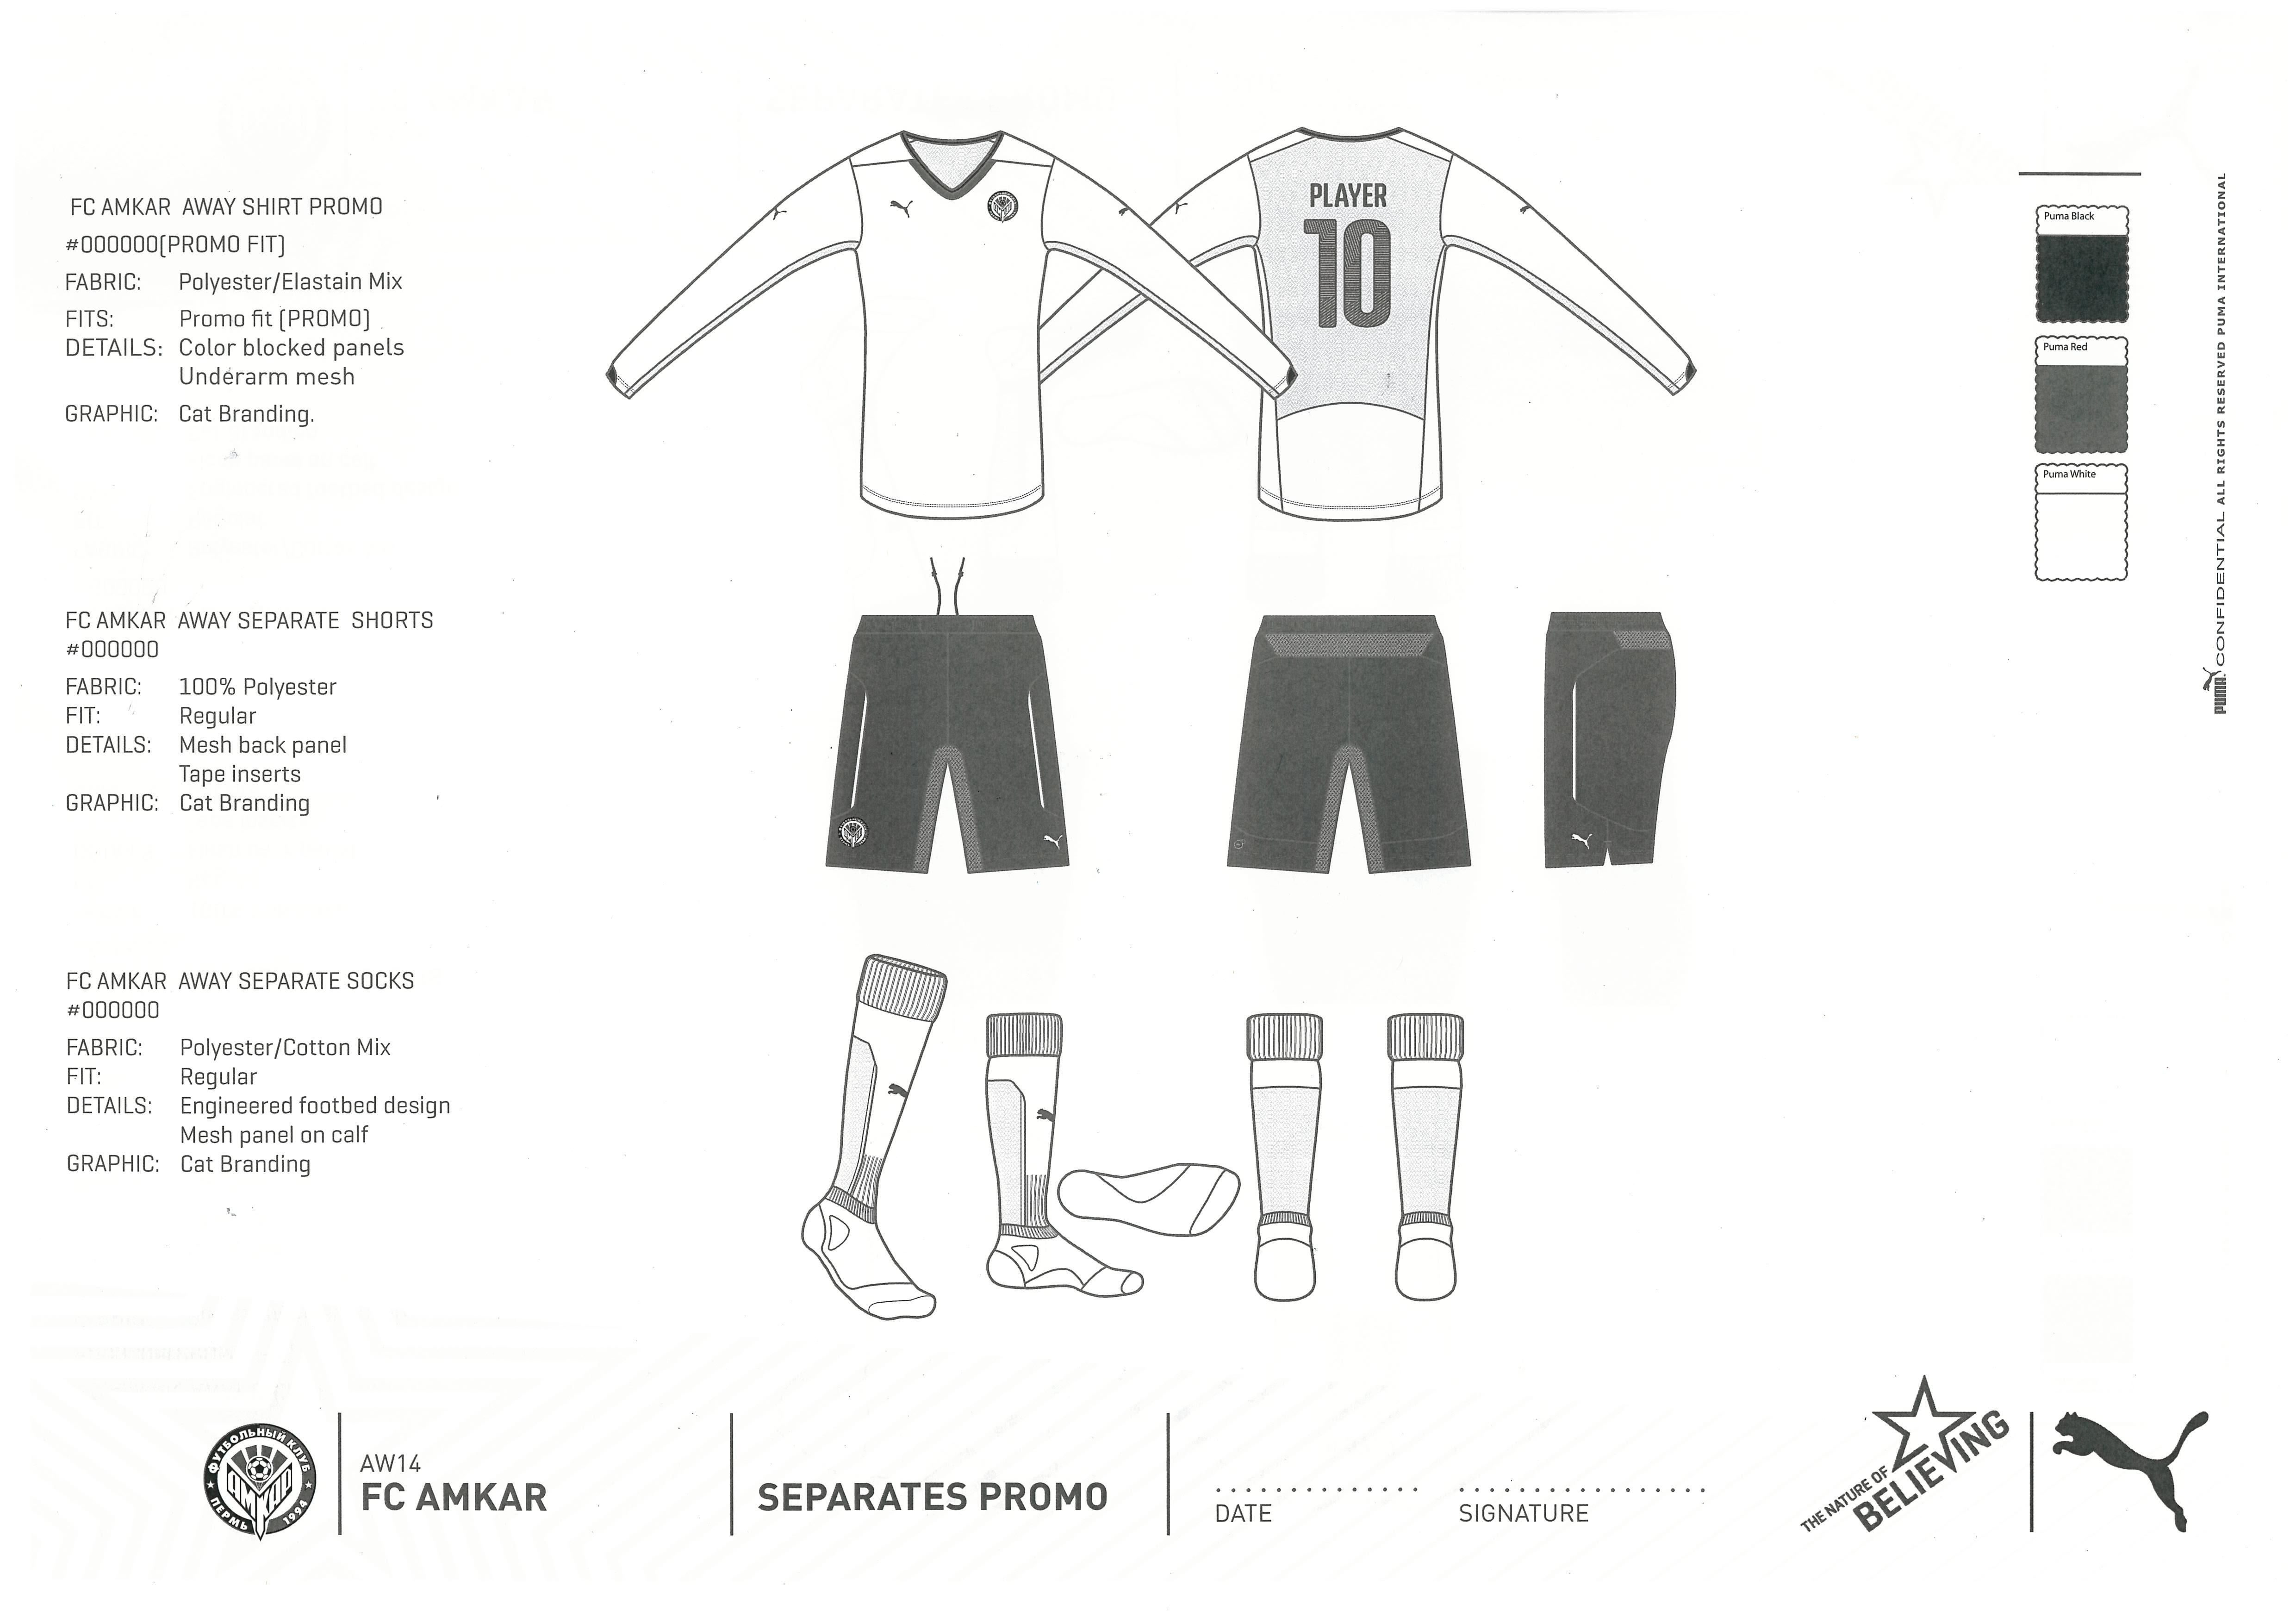 FC Amkar Away Shirt Promo